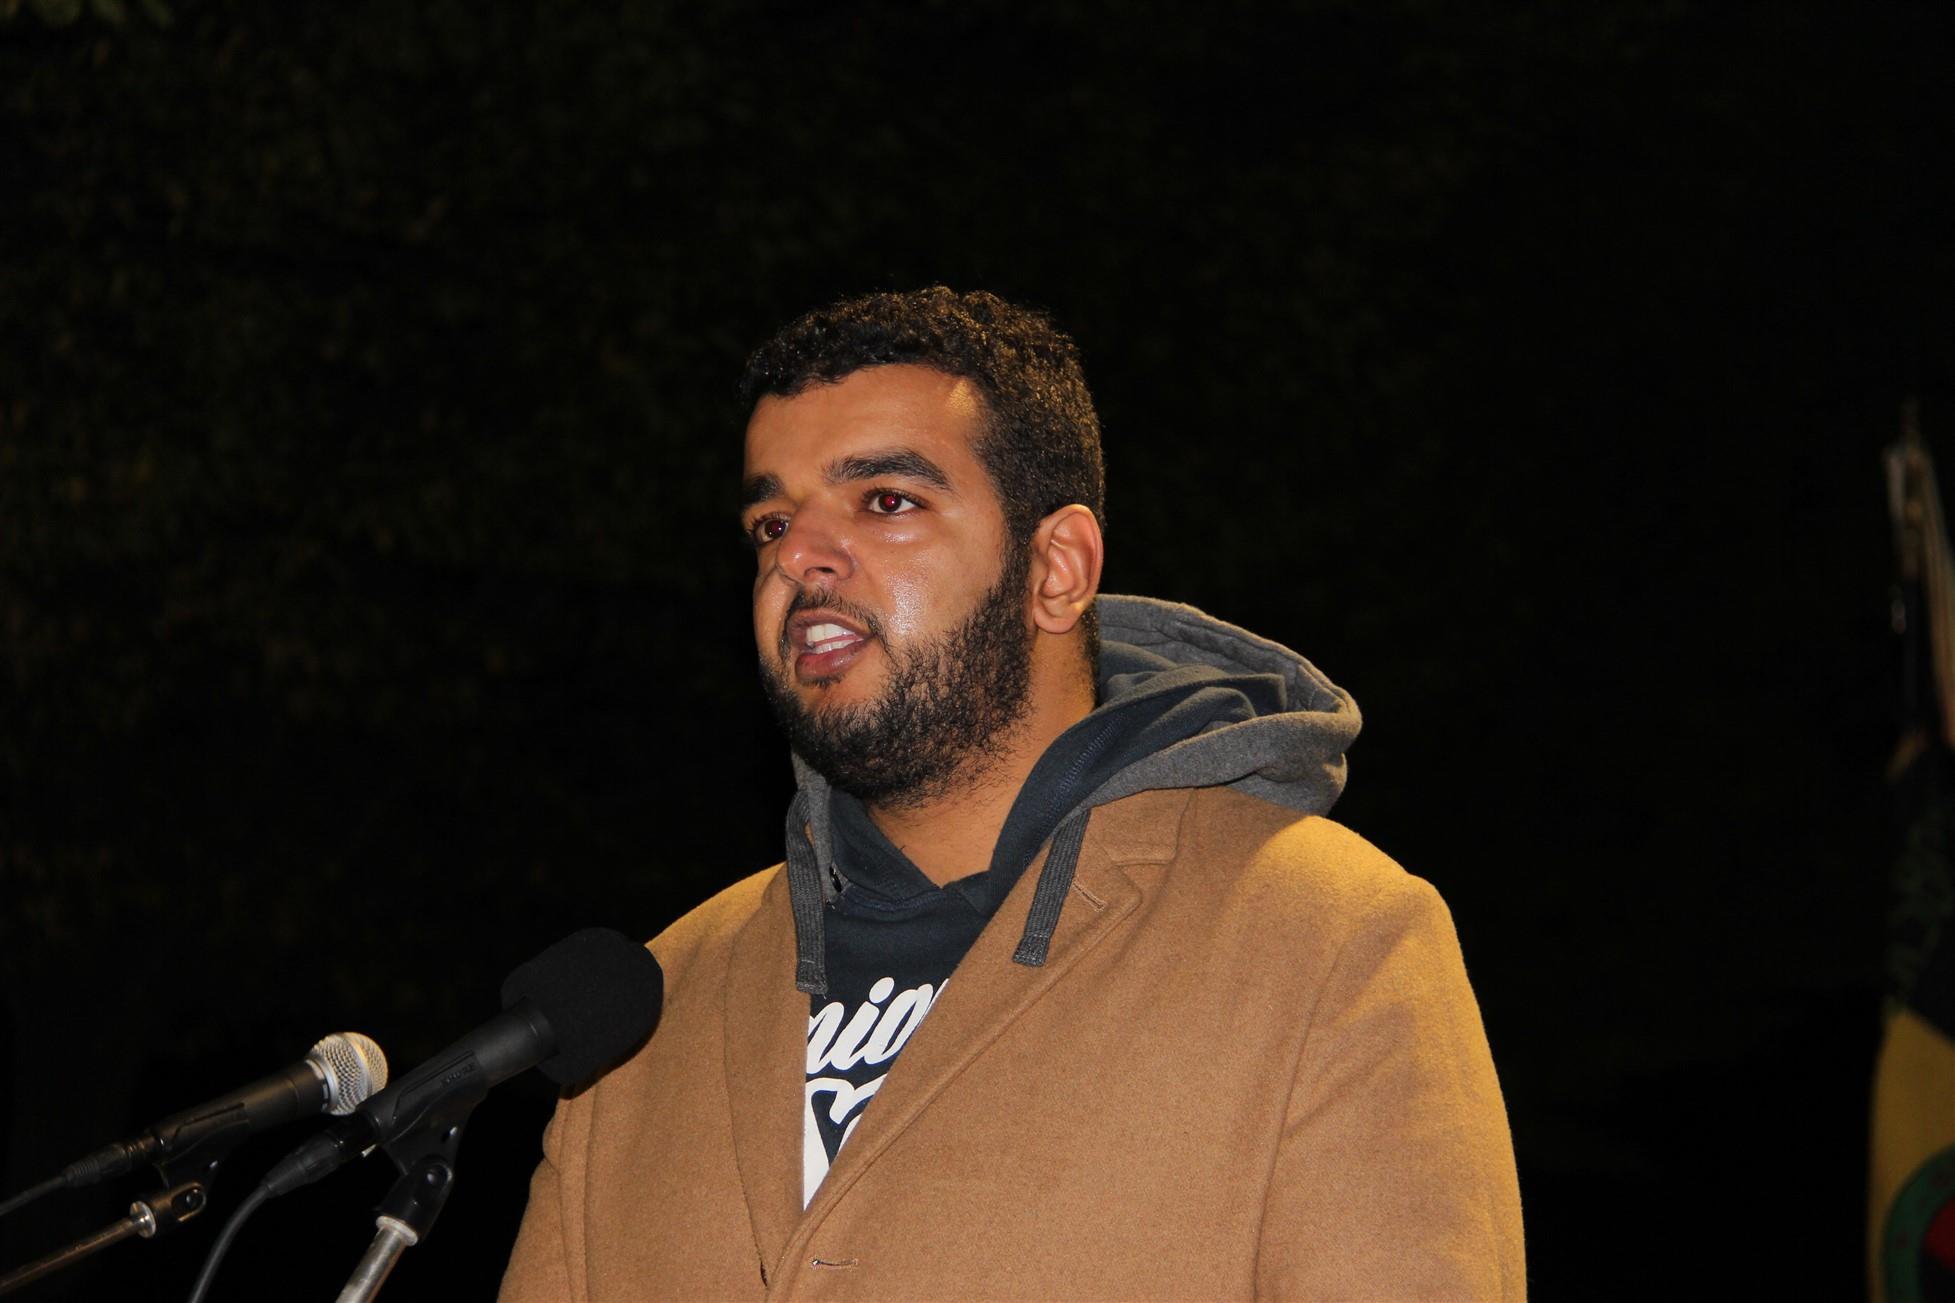 23. Yassin El Attar